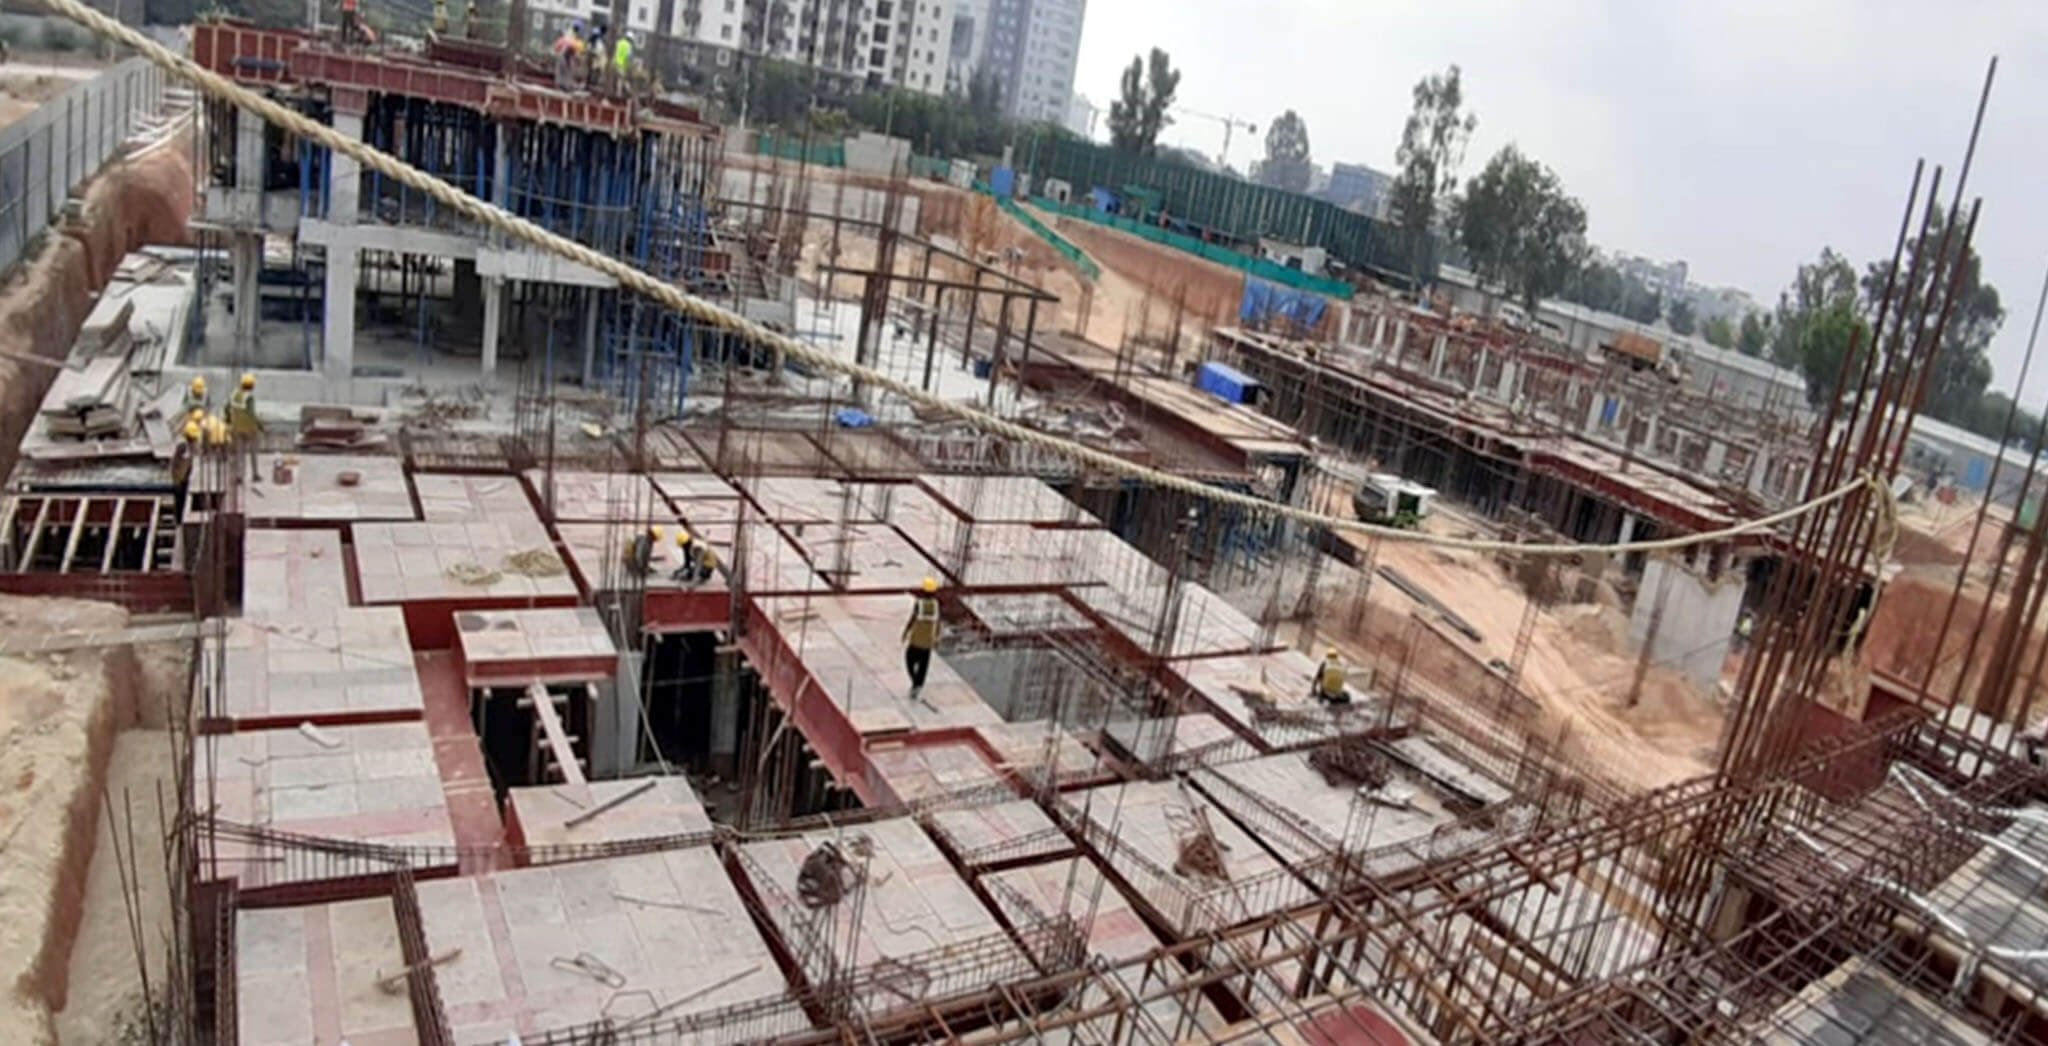 Jan 2020 - R Block: Ground floor slab shuttering & rebar work-in-progress